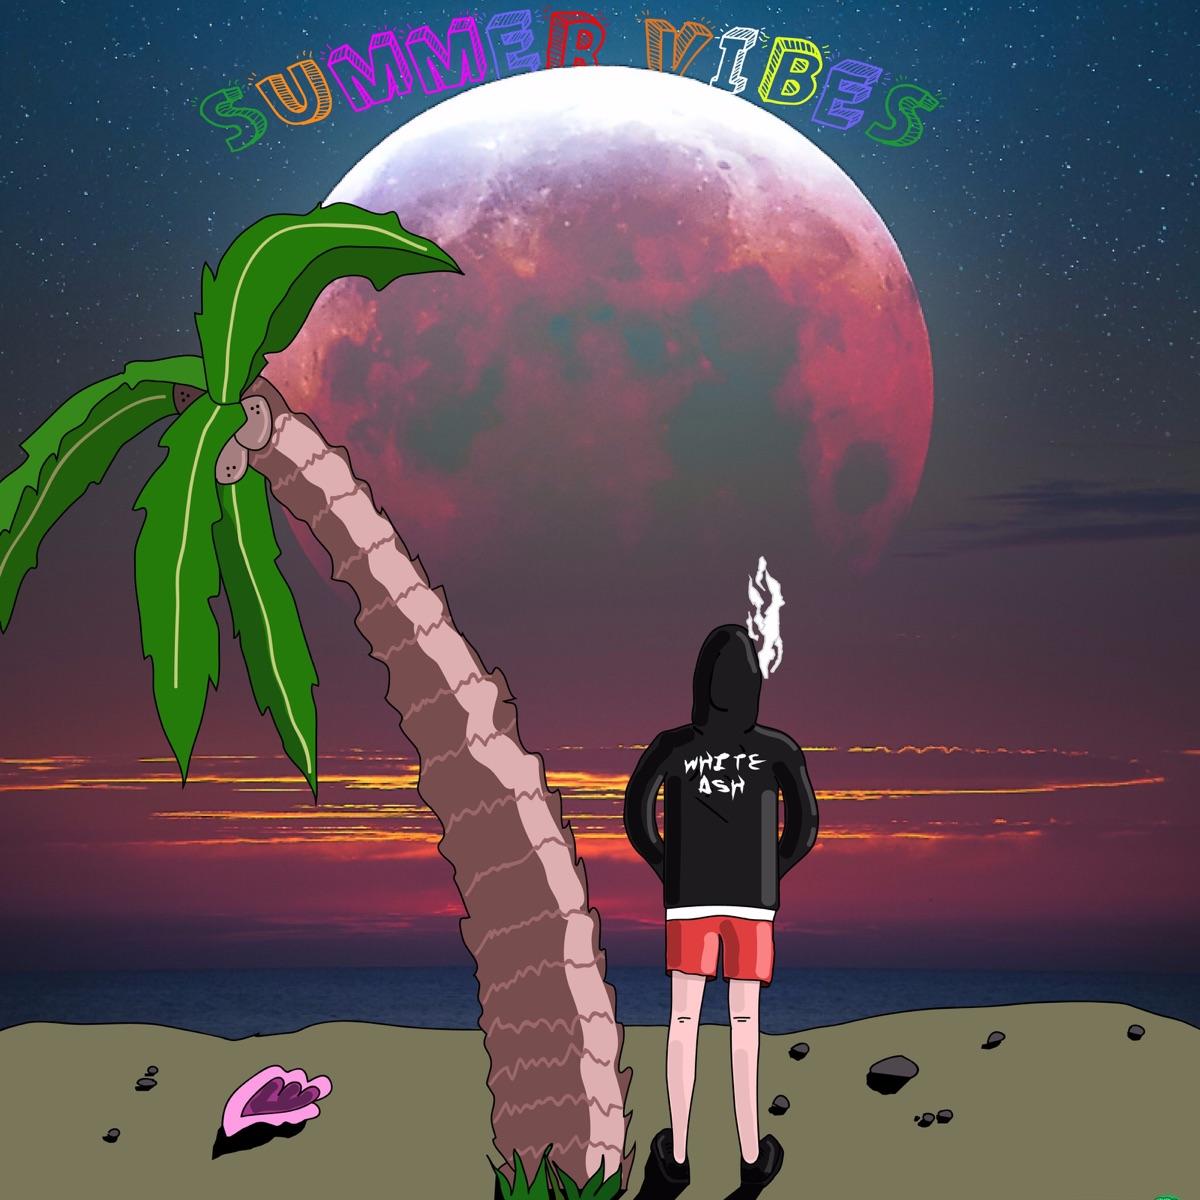 Summer Vibes - Single WHITE ASH CD cover